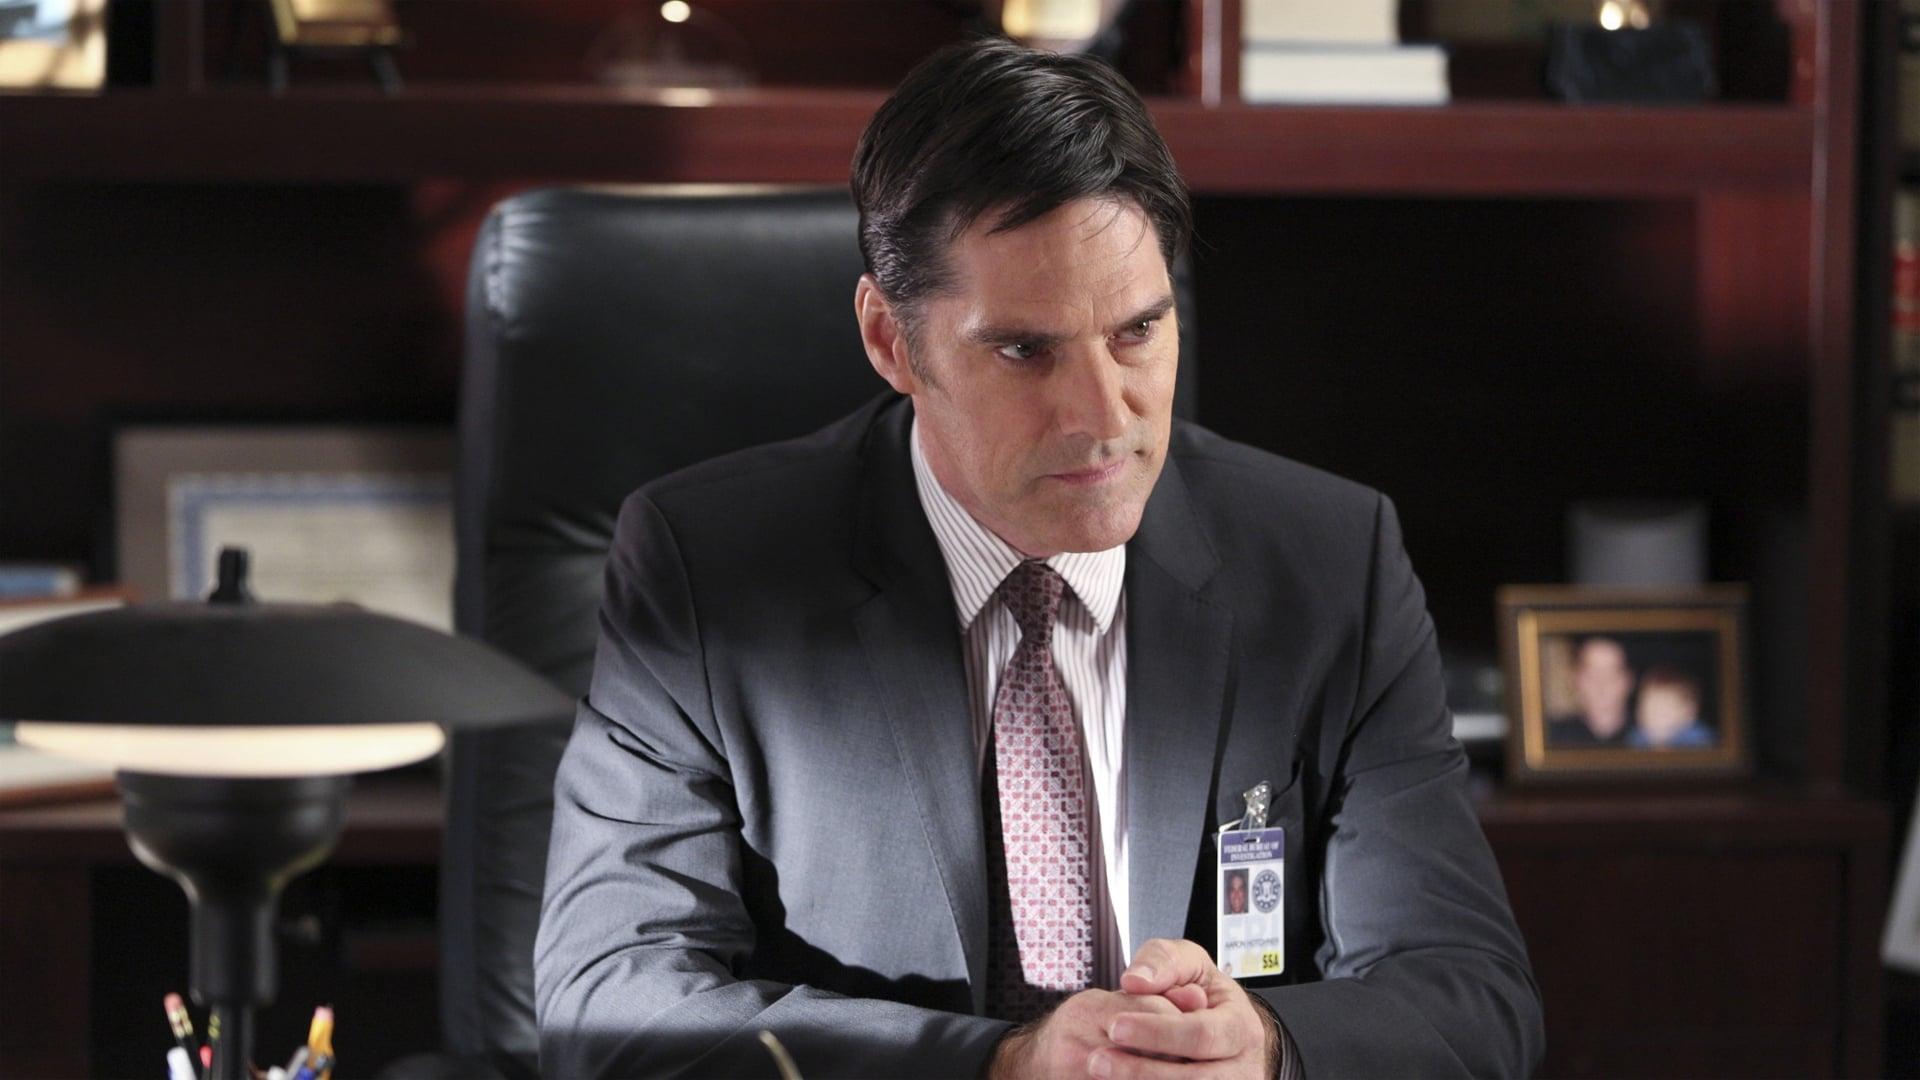 Criminal Minds - Season 11 Episode 1 : The Job